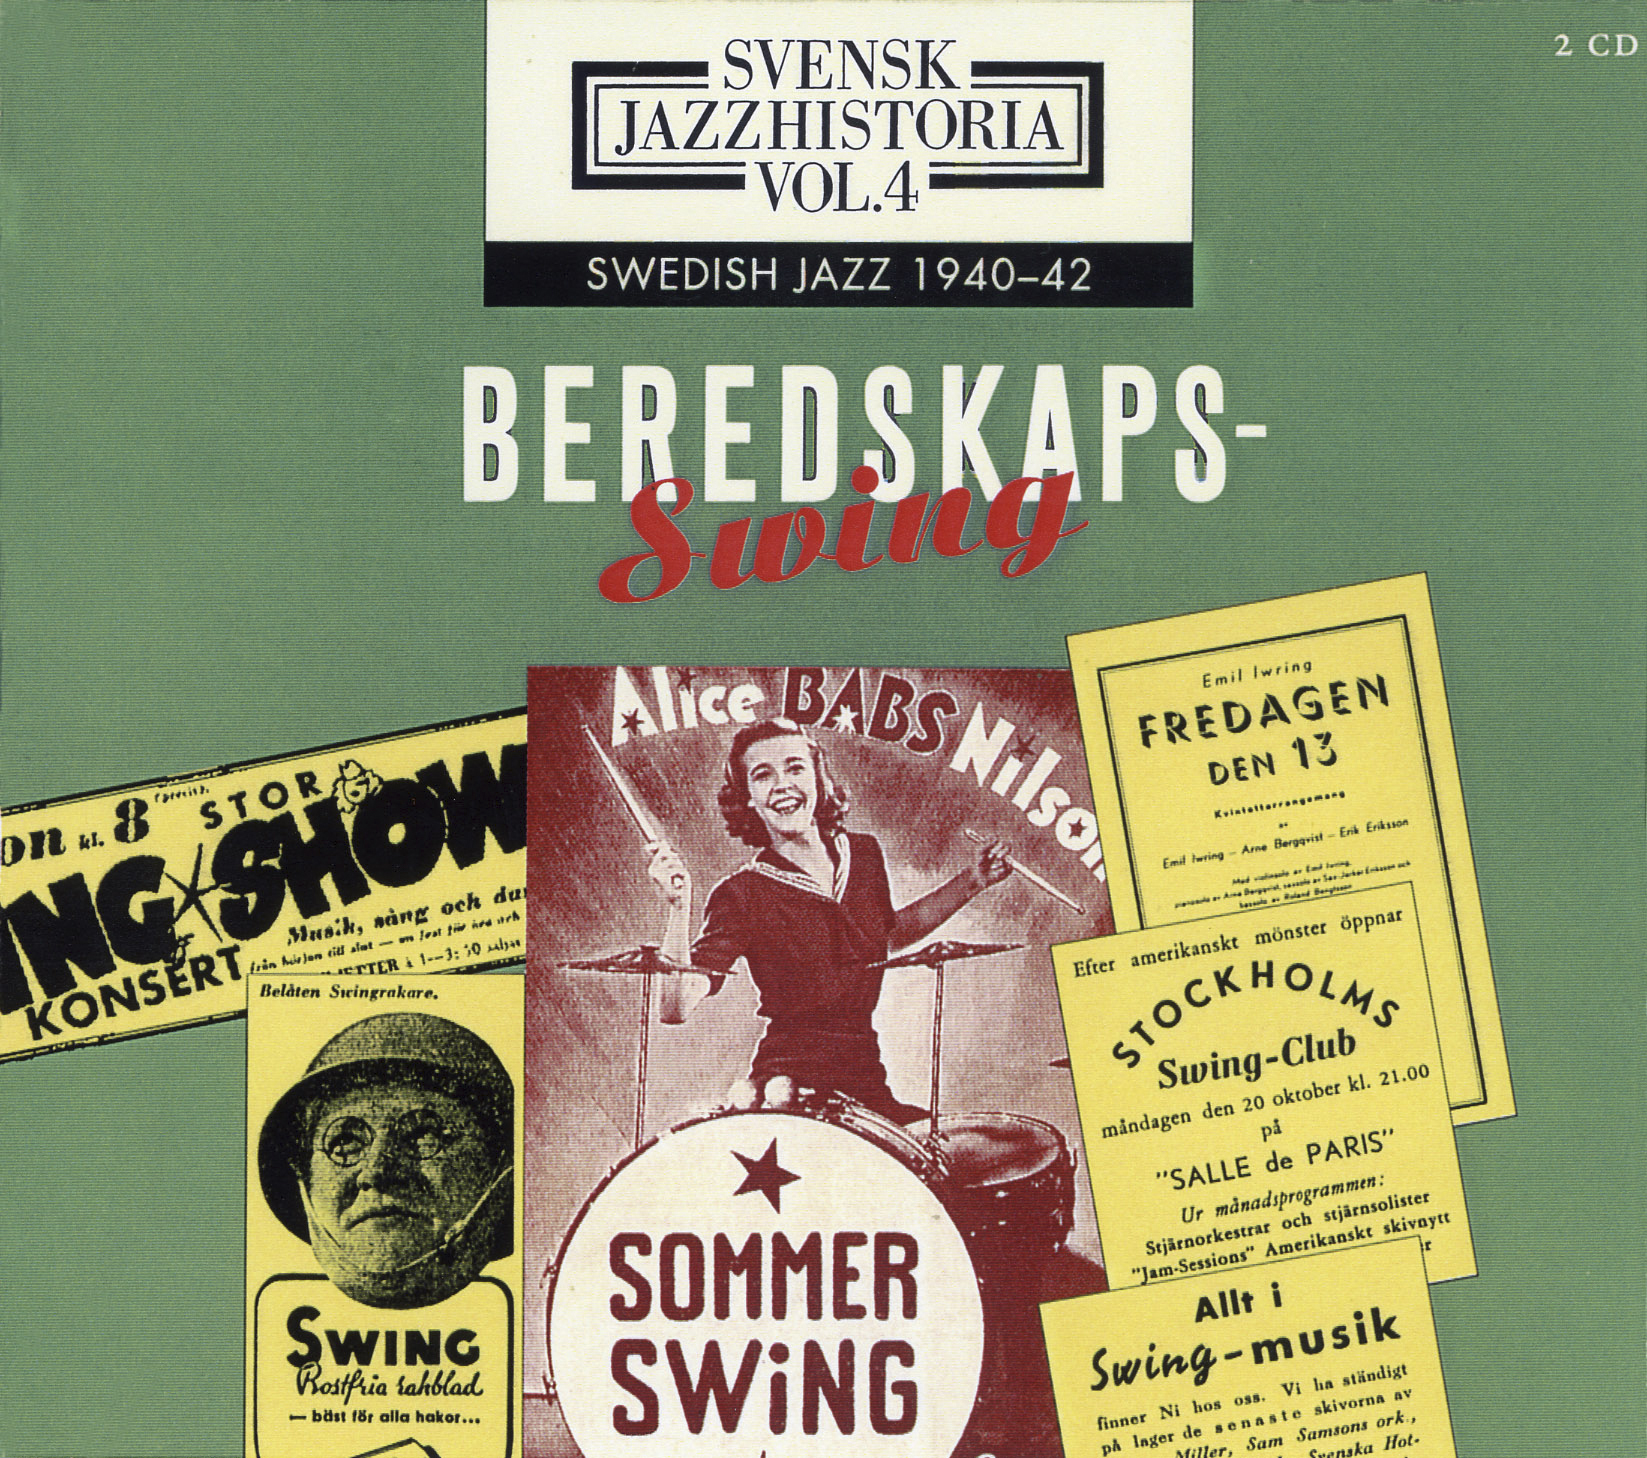 Beredskapsswing vol. 4, 1940-42